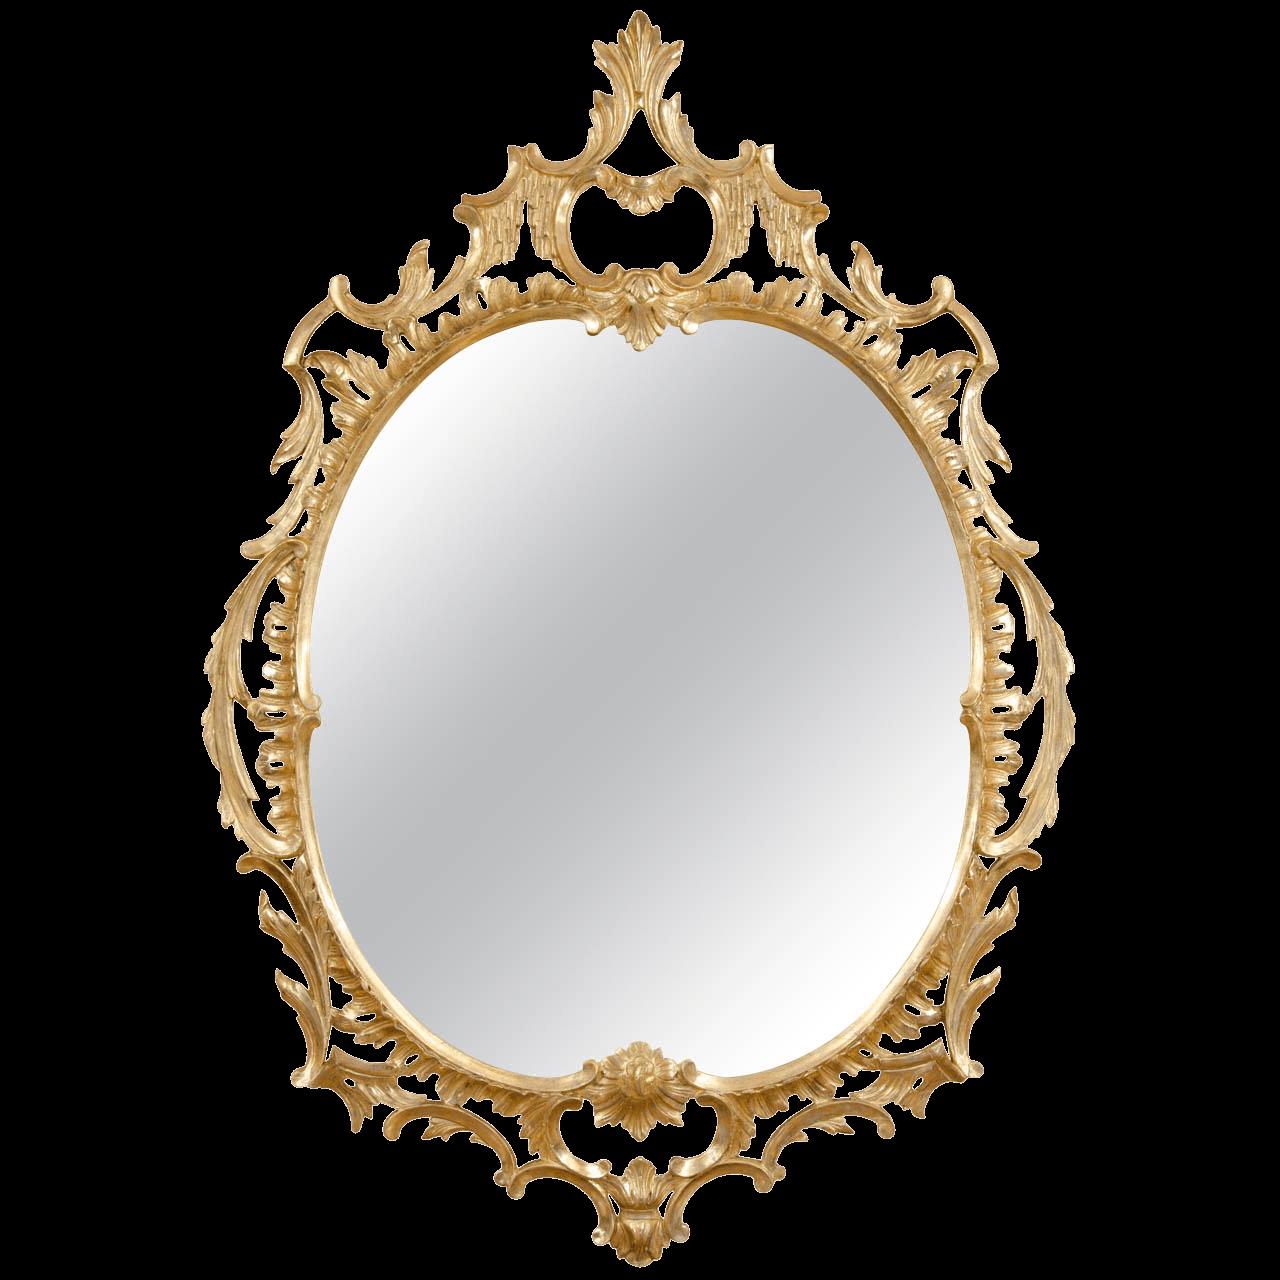 Download Mirror Image Hq Png Image Freepngimg